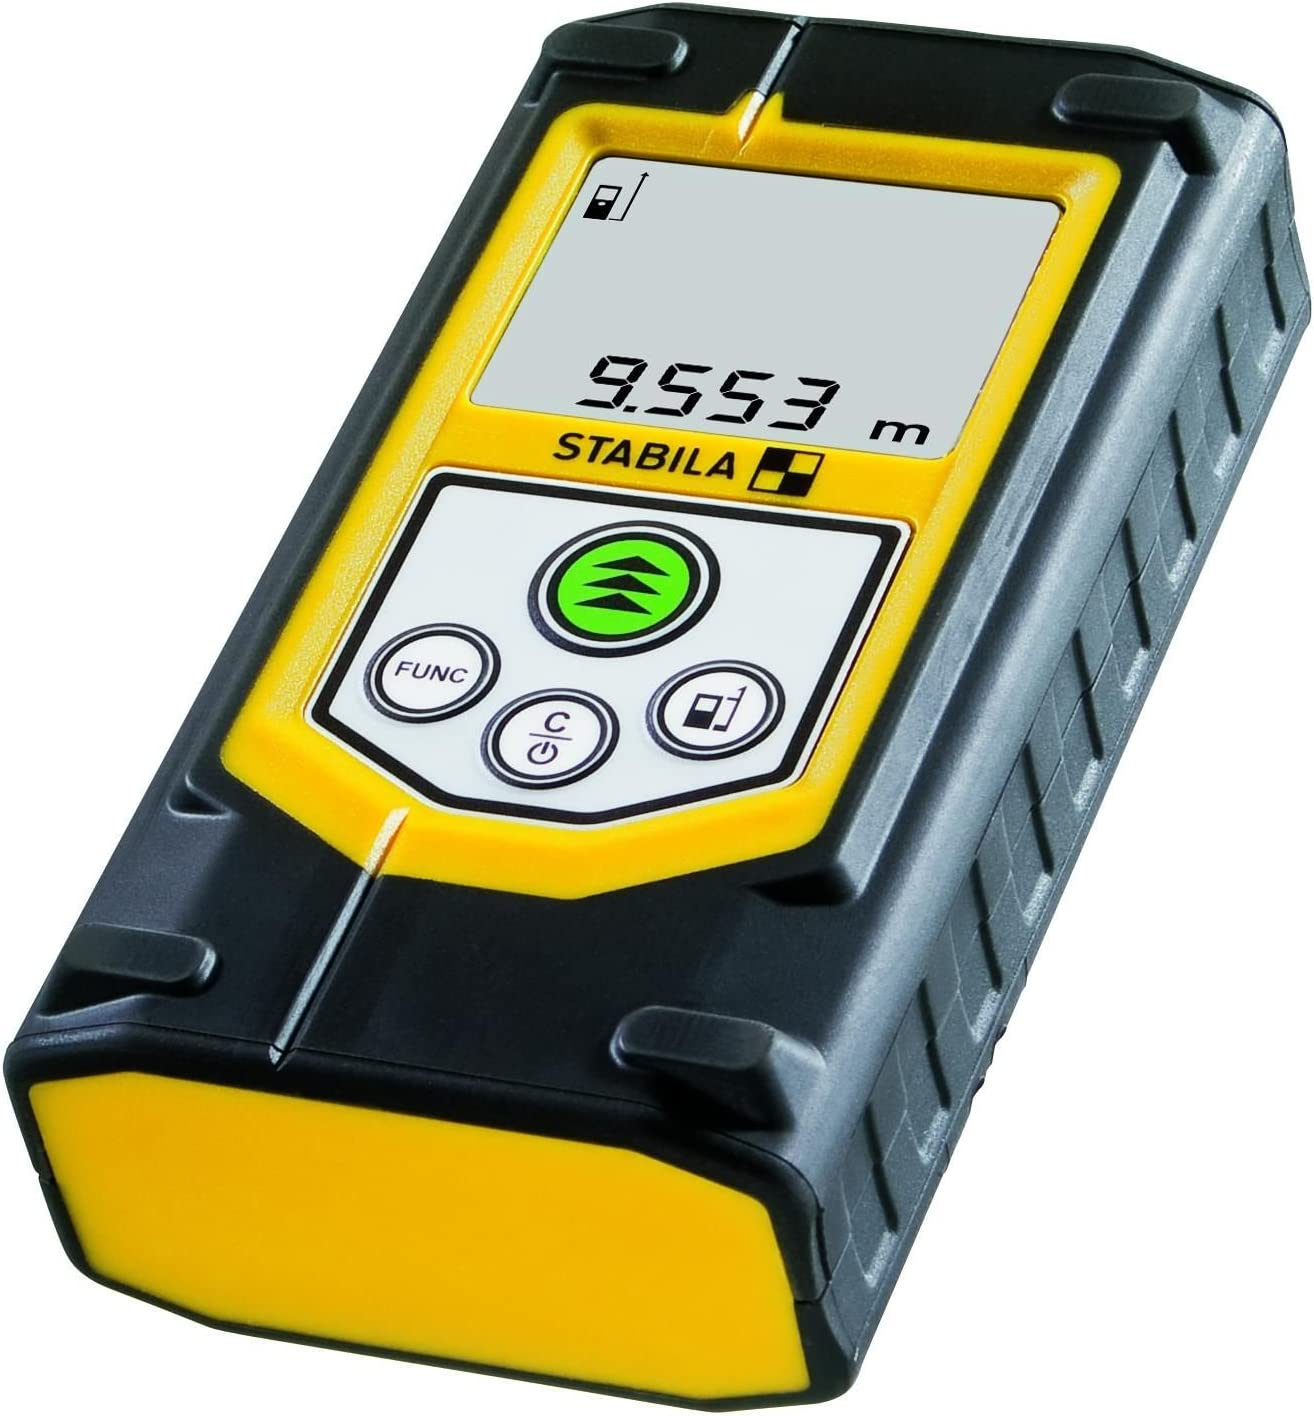 Stabila laser Entferungsmesser LD 220 Nº 18816 de mesure de 0,2-30 mètres